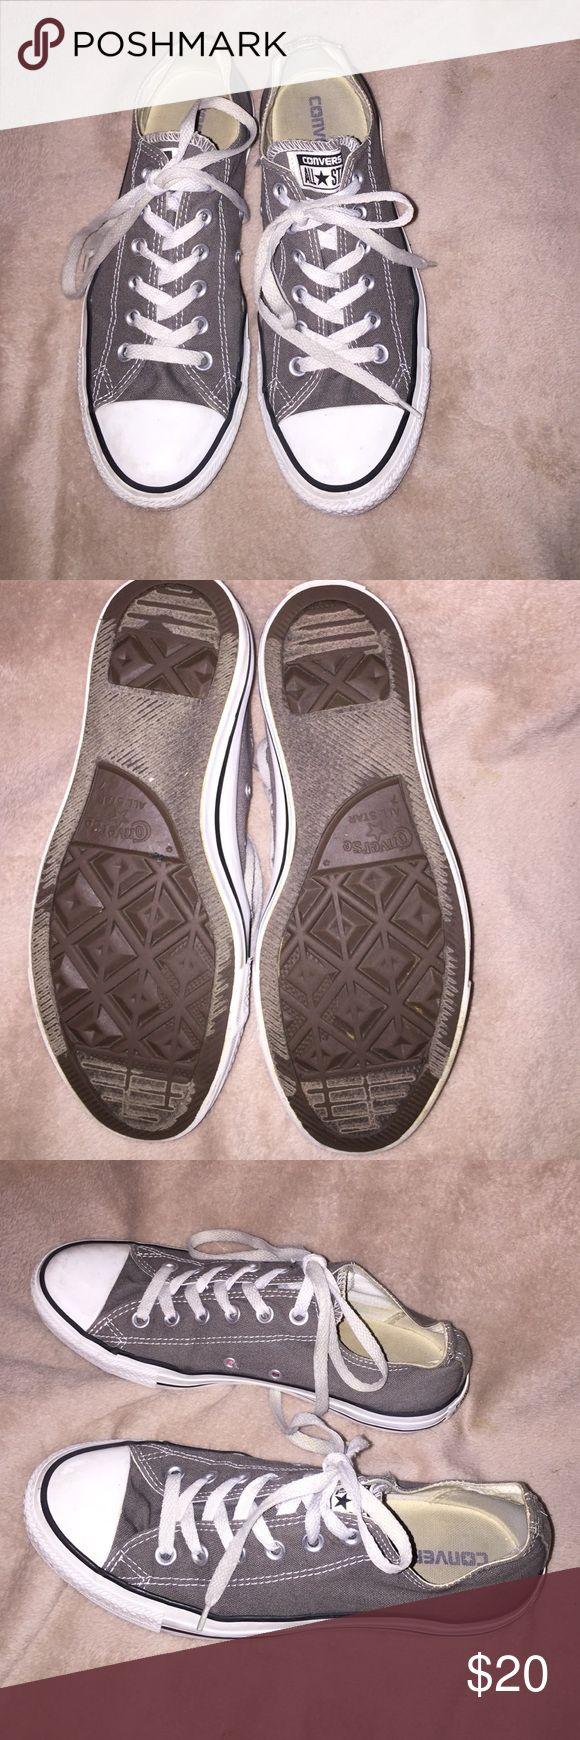 Converse AllStar canvas Sneaker- Gray. Size 7 Converse AllStar canvas Sneaker- Gray. Size 7 Converse Shoes Sneakers